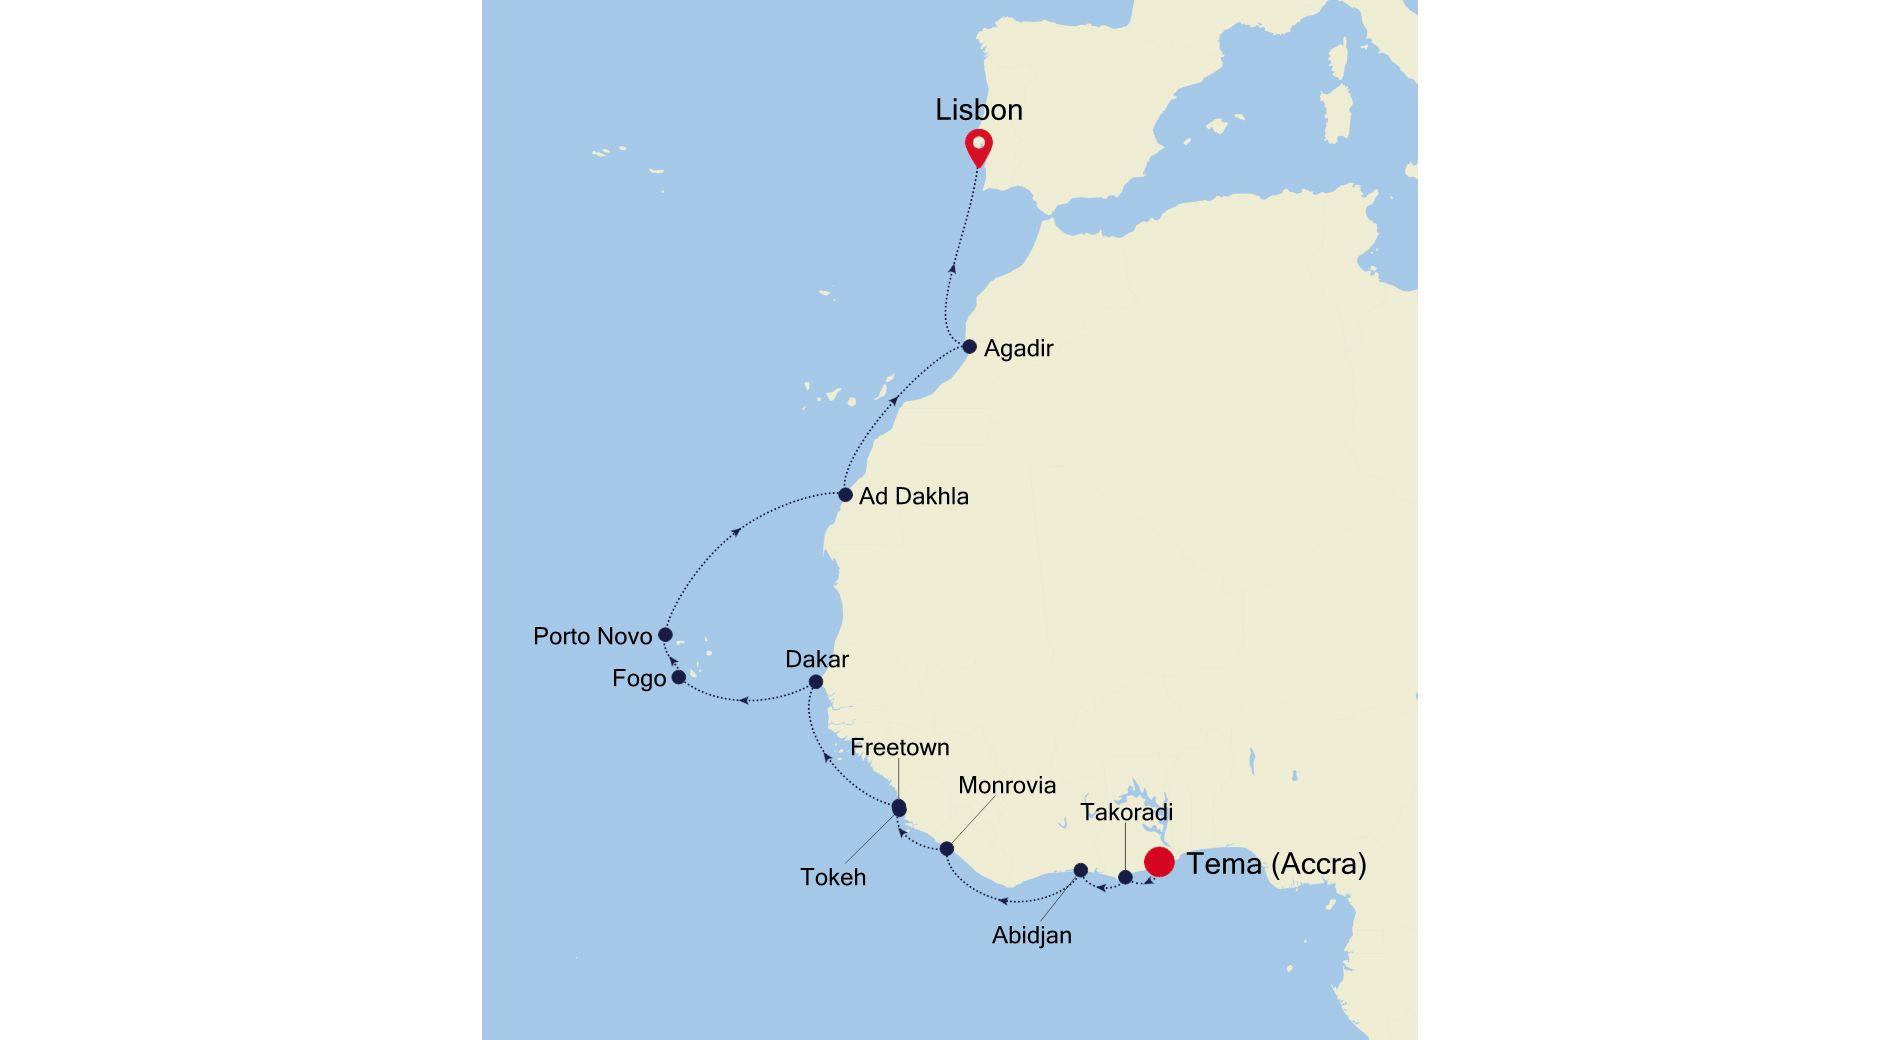 E4210417018 - Accra a Lisbon